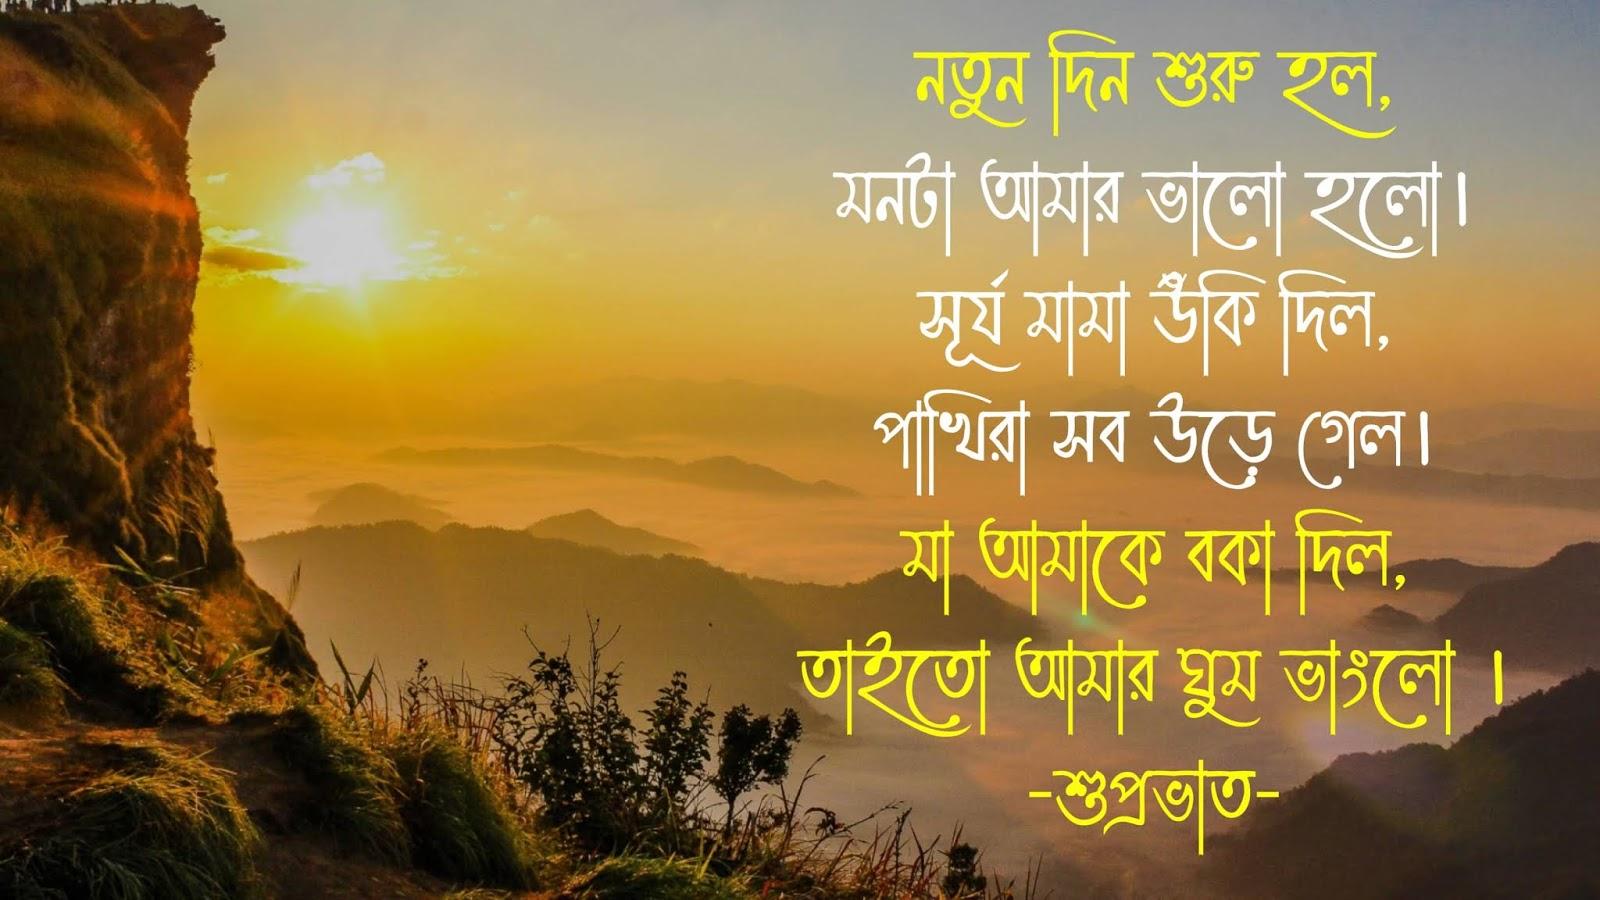 Good Morning Subho Sokal Sms in Bengali